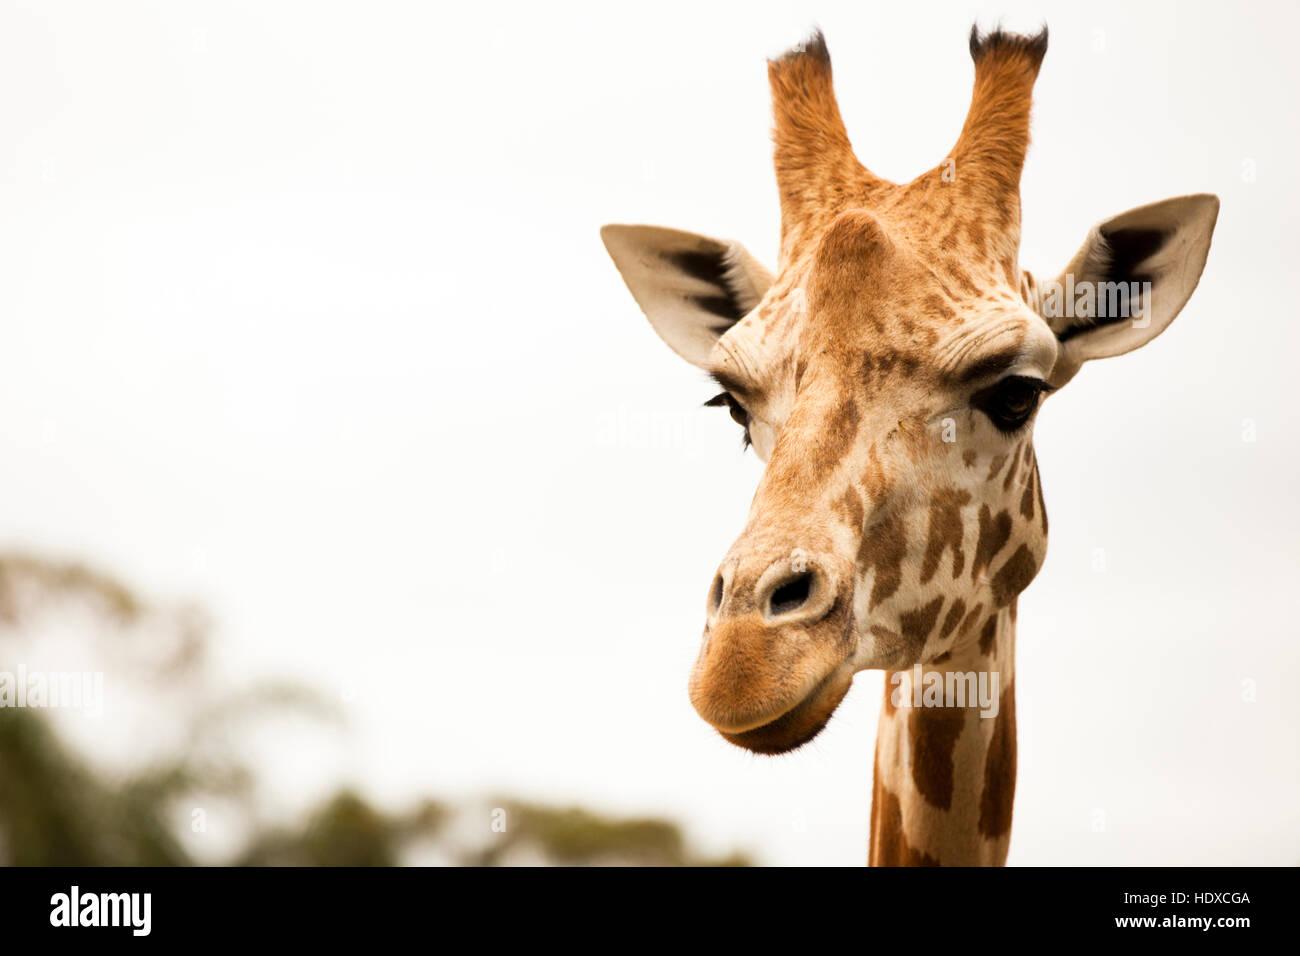 Closeup portrait of giraffe looking at camera - Stock Image